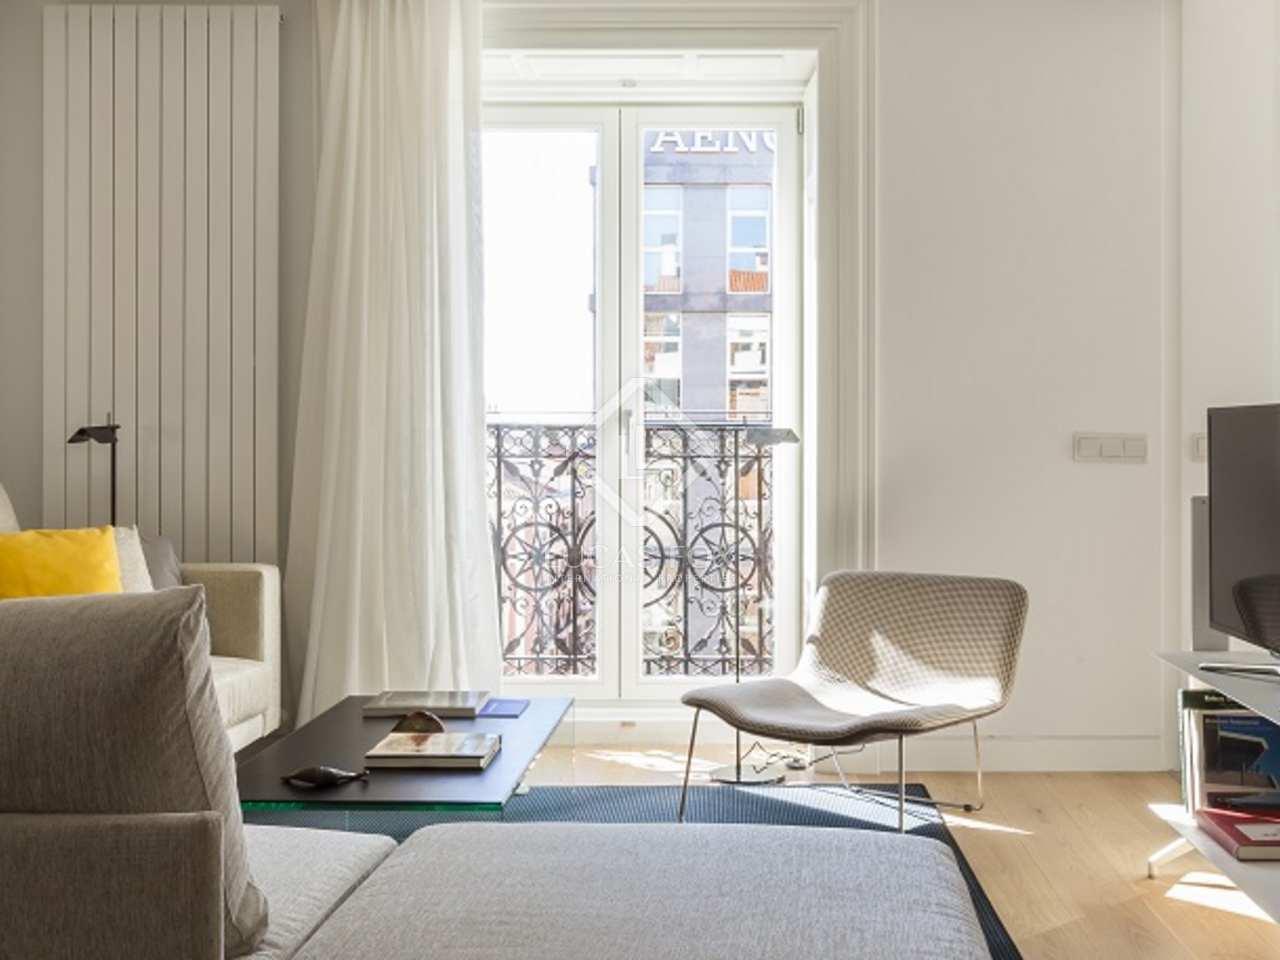 24 exclusivos apartamentos en alquiler en chamber - Zona chamberi madrid ...